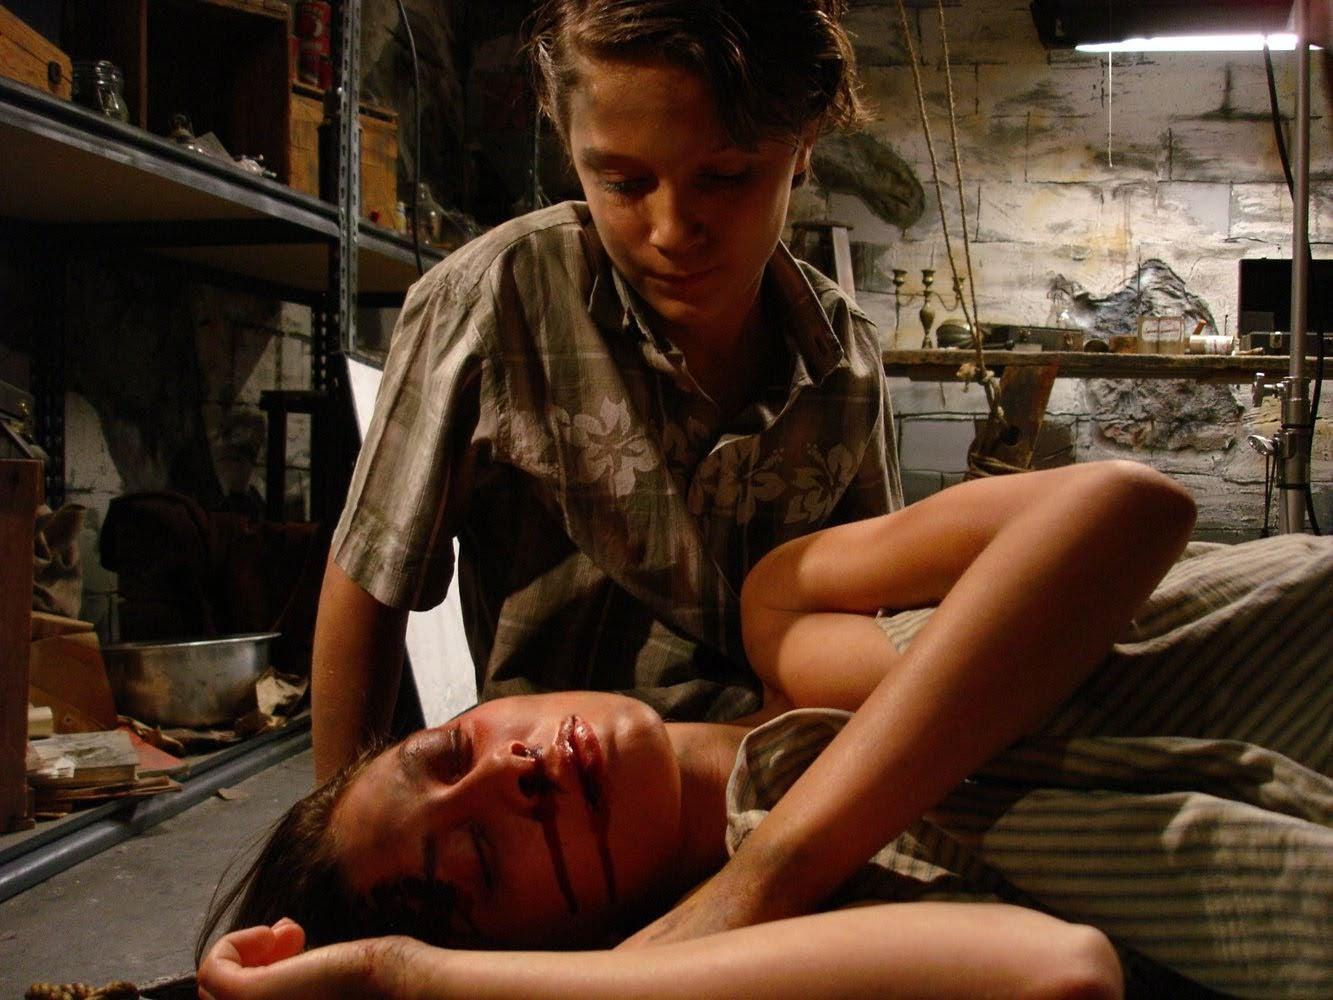 Megan American Teen Trailer 113